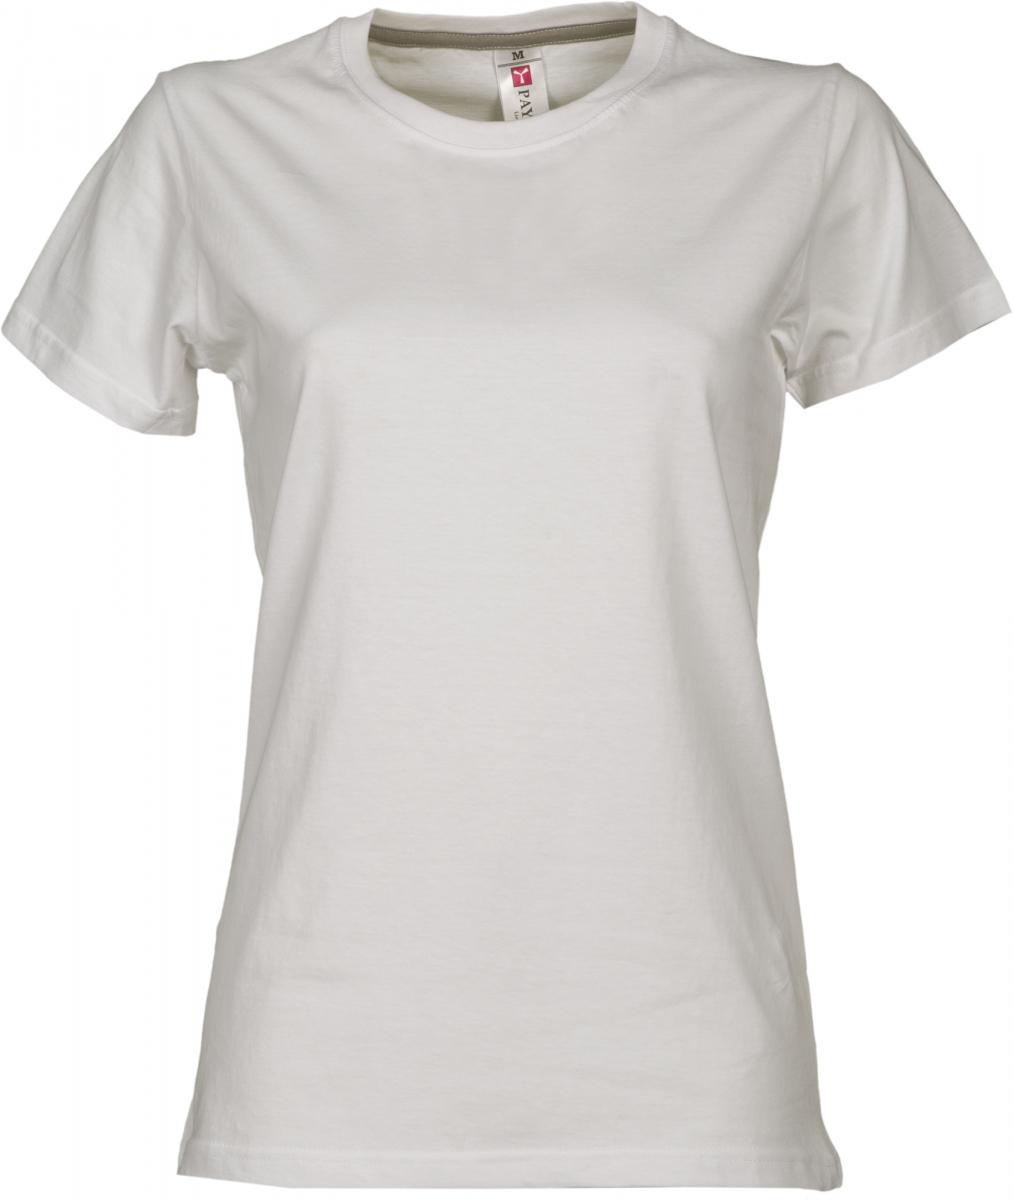 0d052b5baae Dámské tričko PAYPER SUNRISE LADY bílá S - reklamní trička